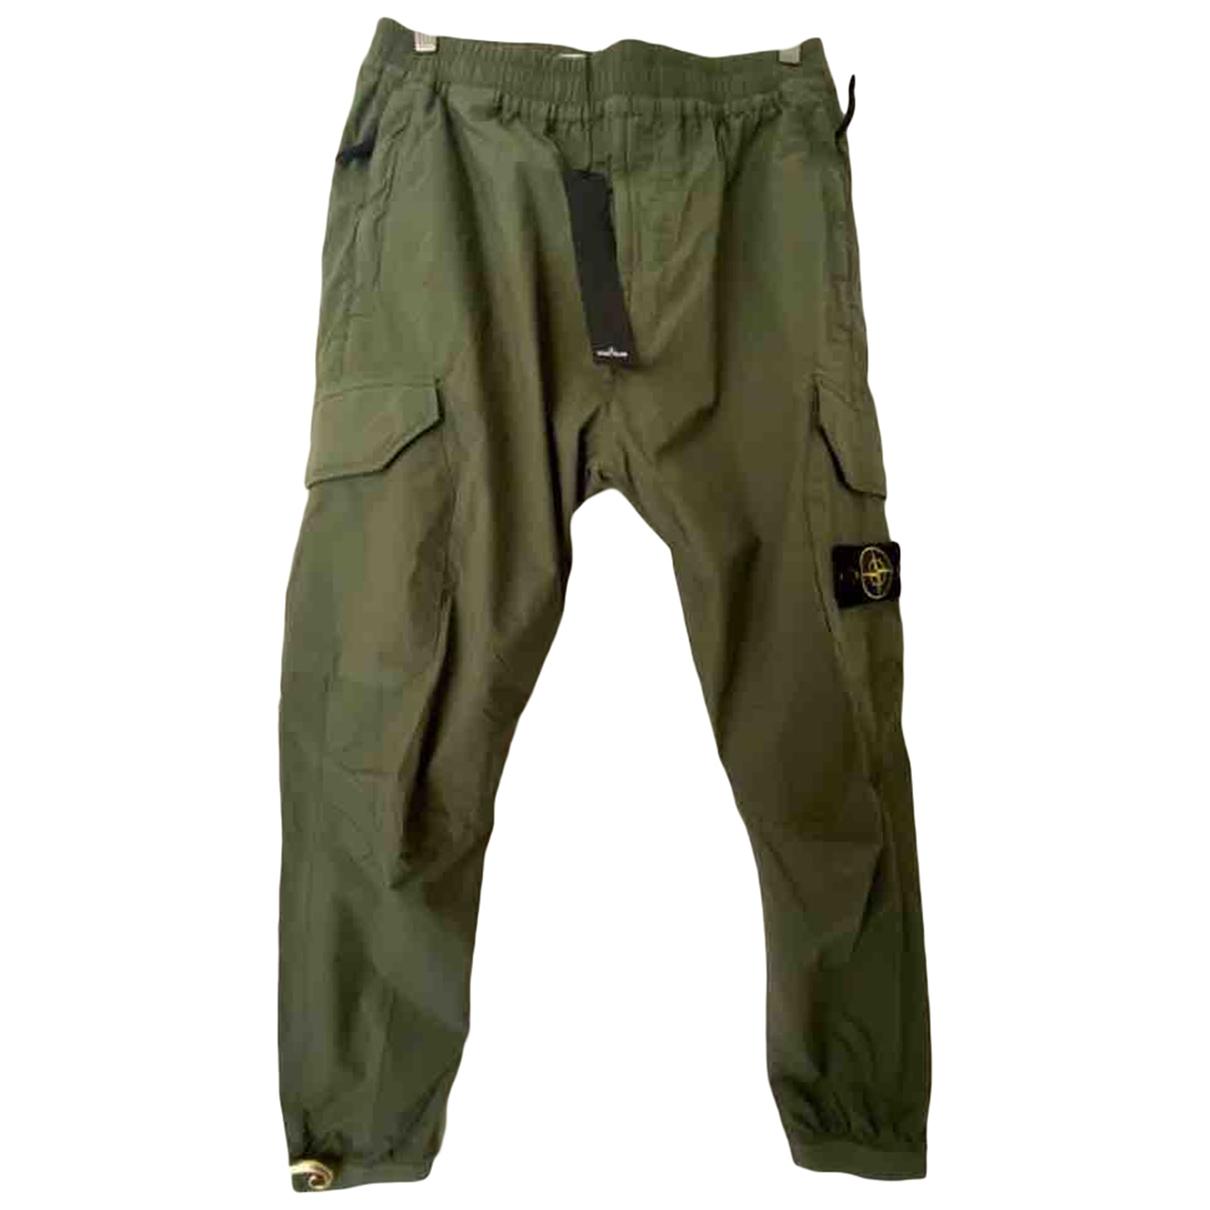 Pantalones en Algodon Caqui Stone Island